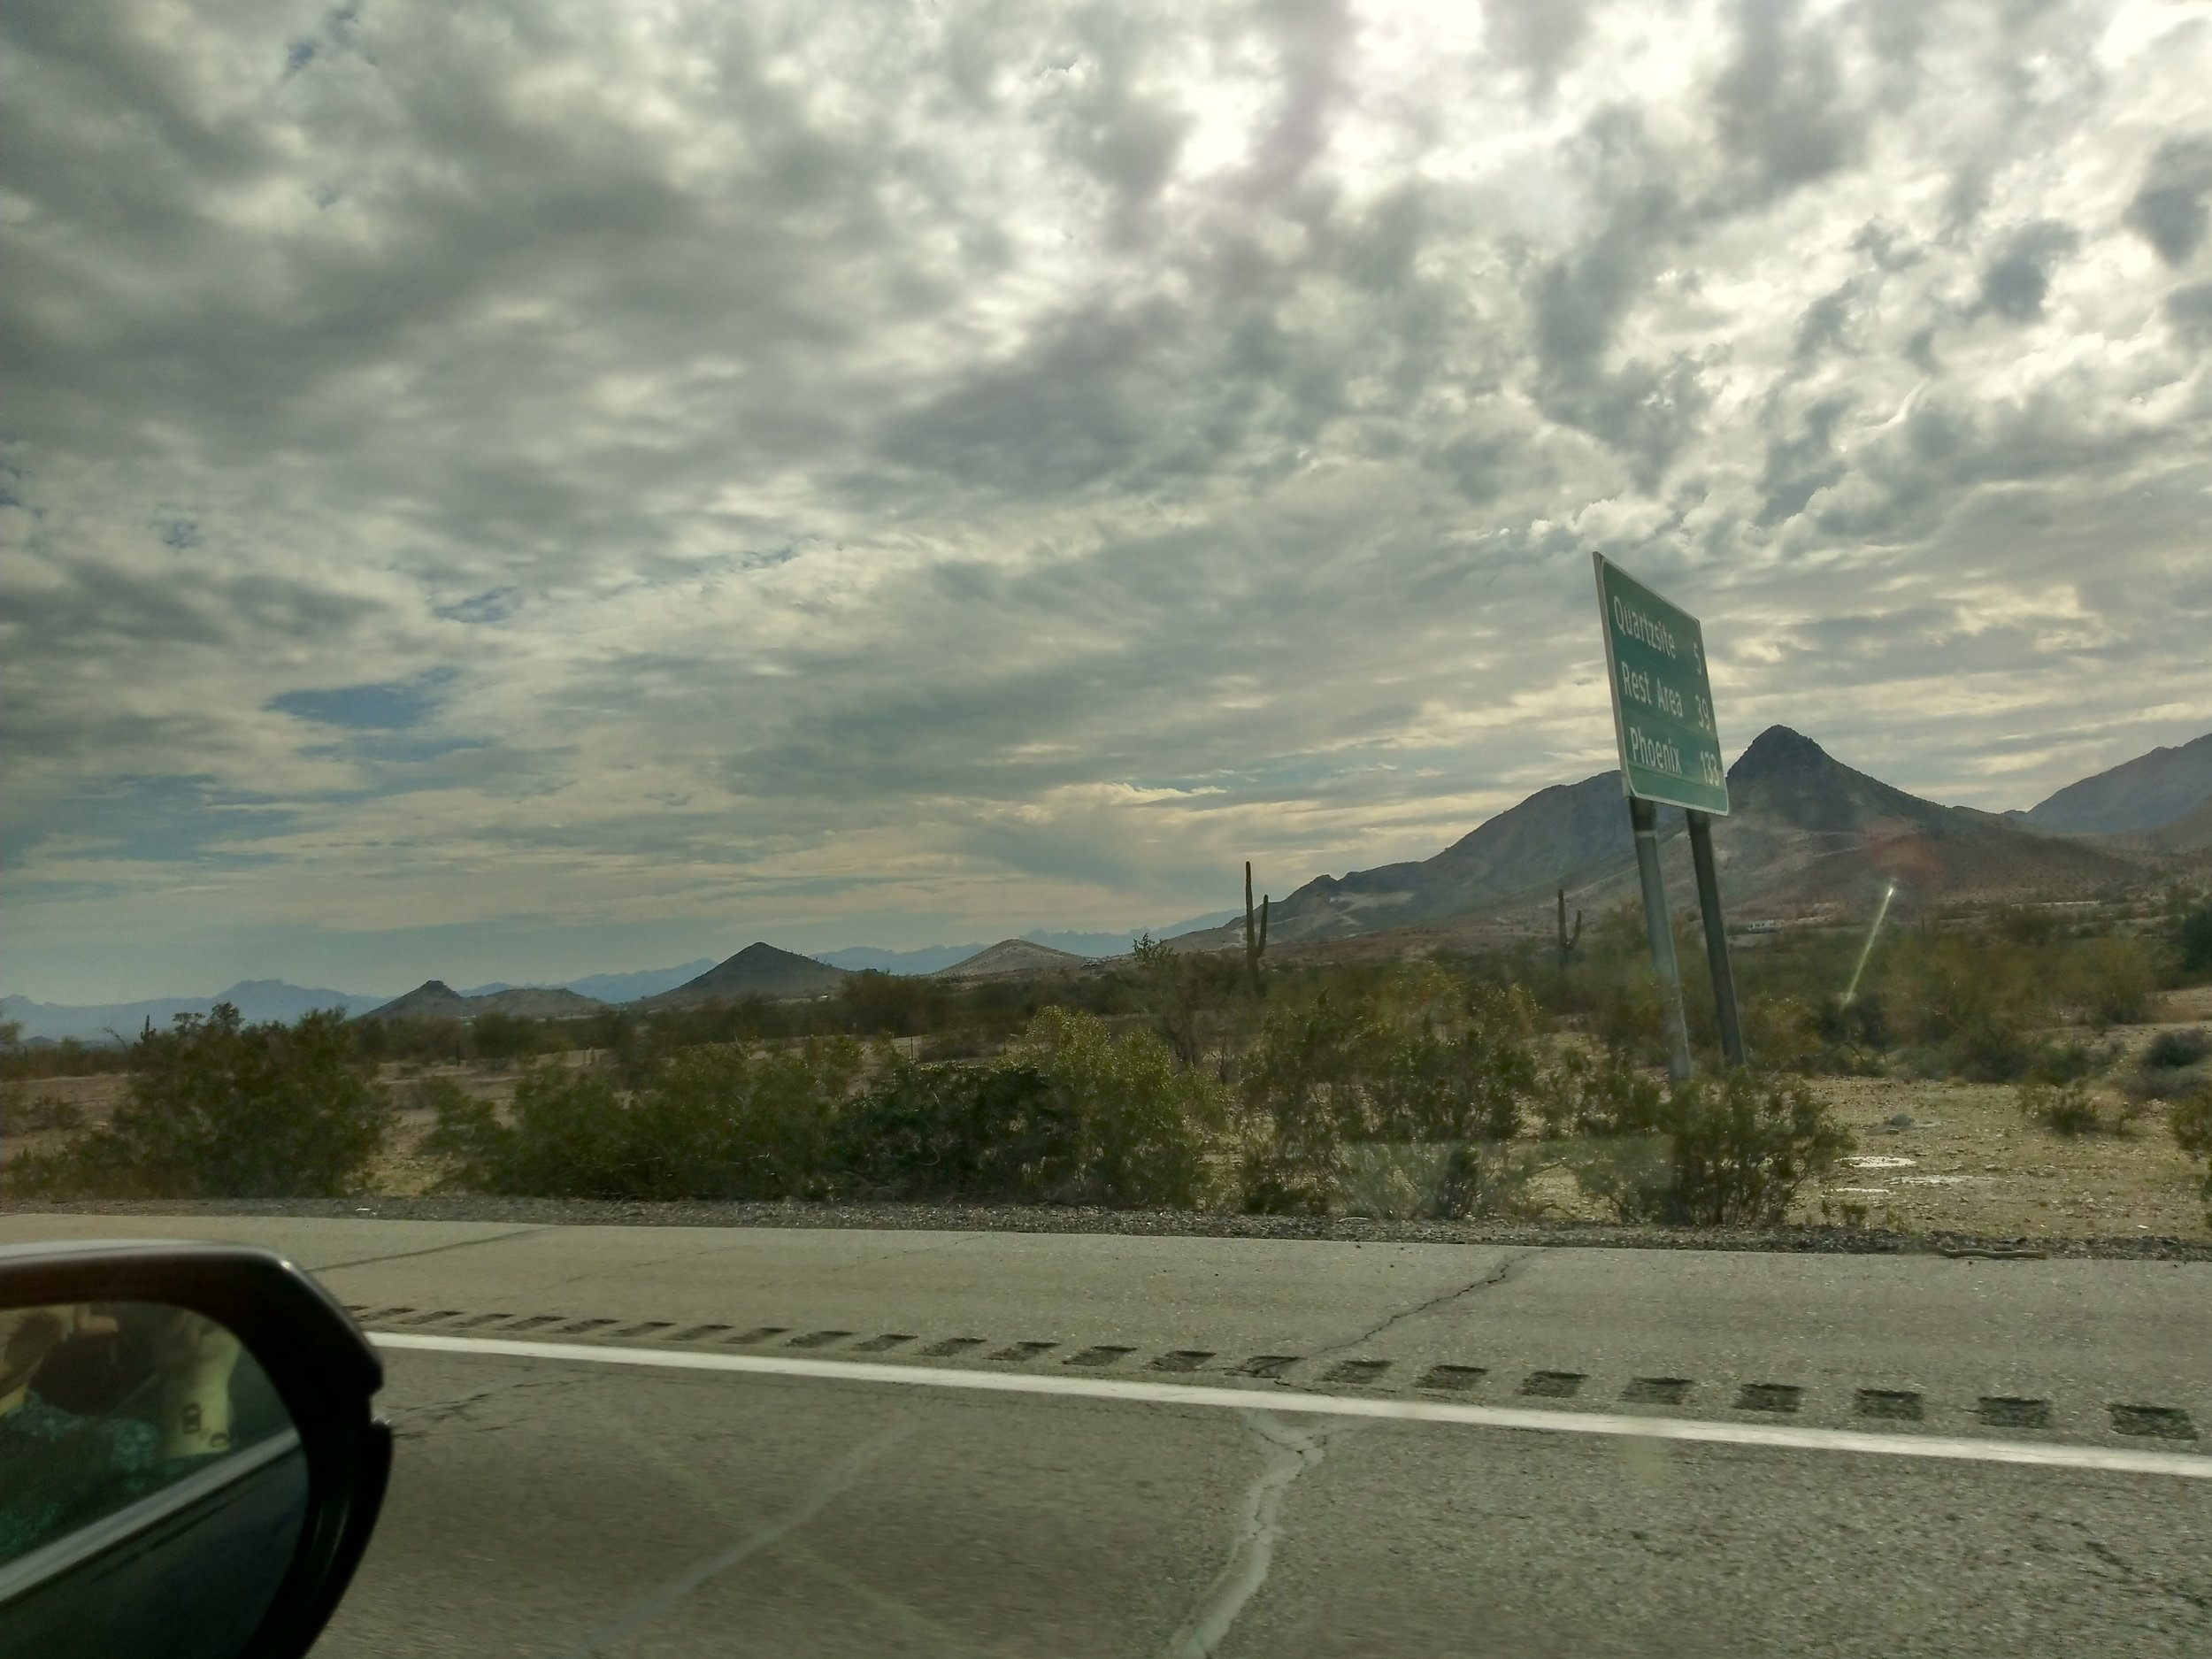 We started seeing saguaro cacti ( Carnegiea gigantea ), around this time.